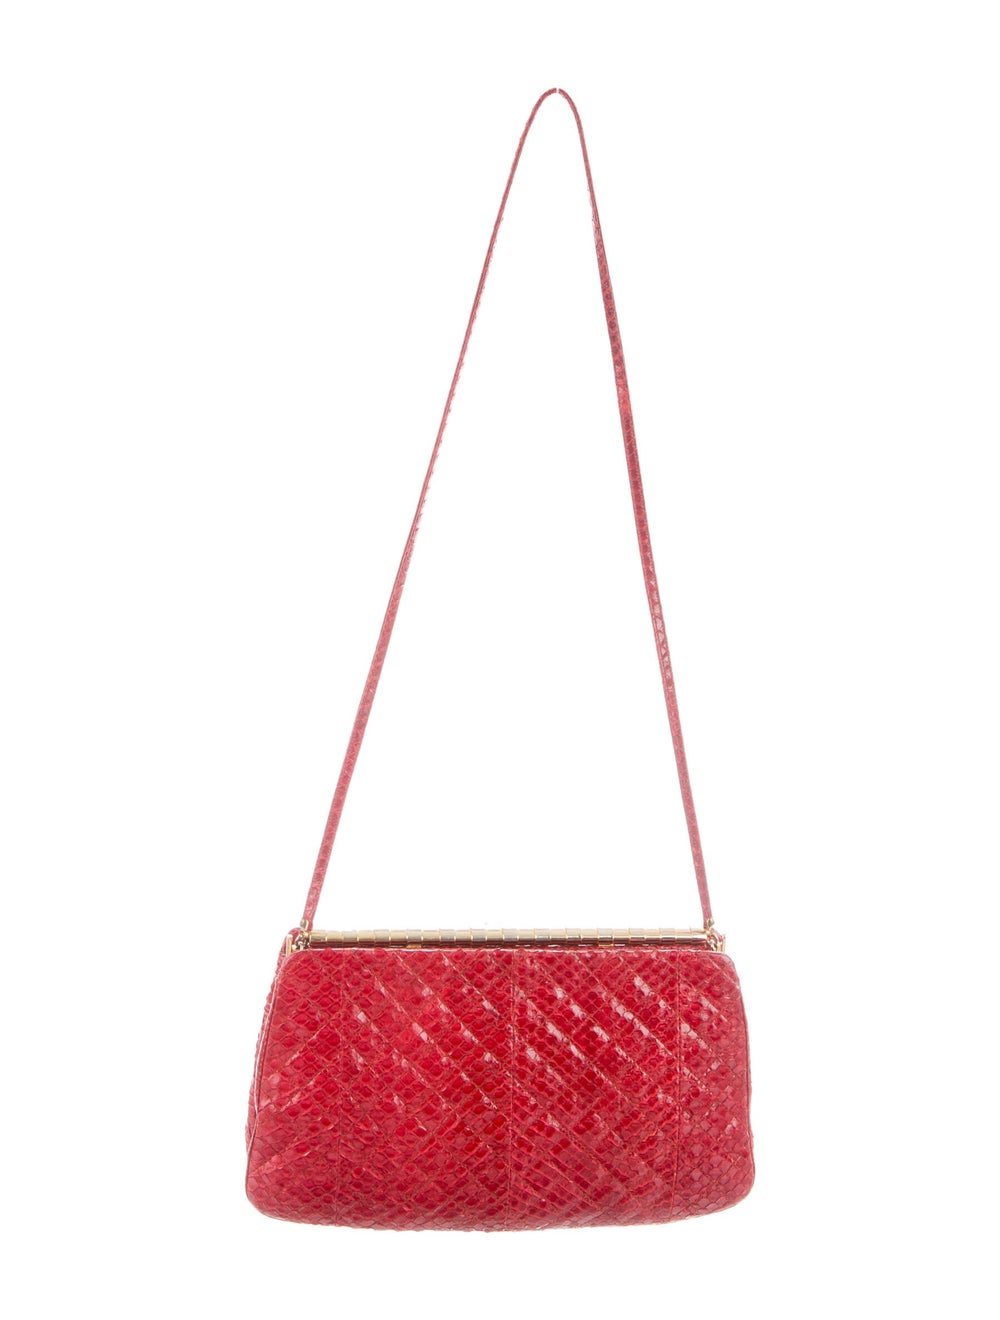 Judith Leiber Snakeskin Evening Bag Red - image 1